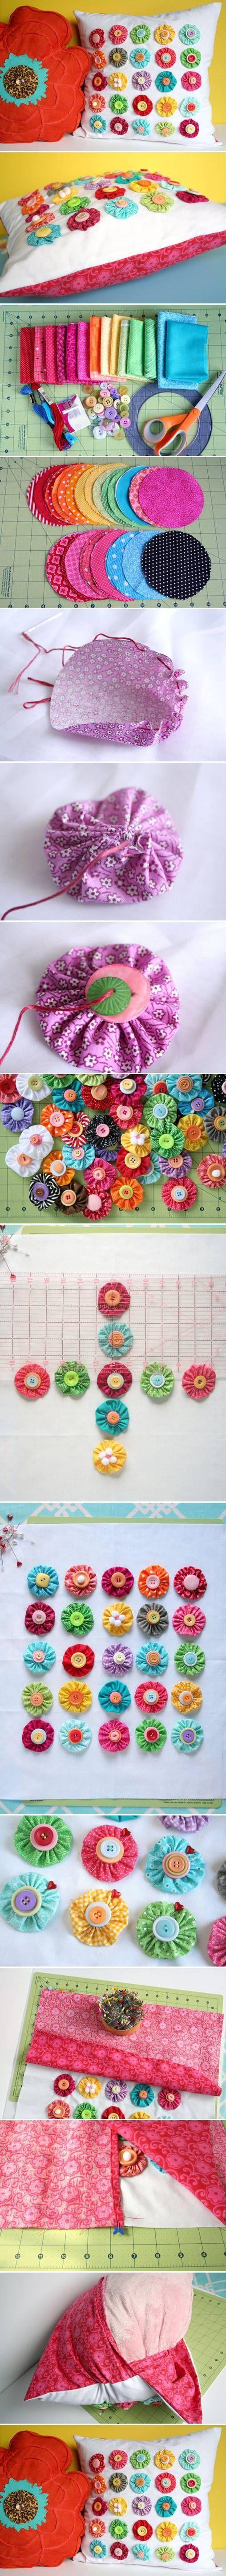 DIY Fabric Decorative Flowers DIY Projects | UsefulDIY.com Follow us on Facebook ==> https://www.facebook.com/UsefulDiy